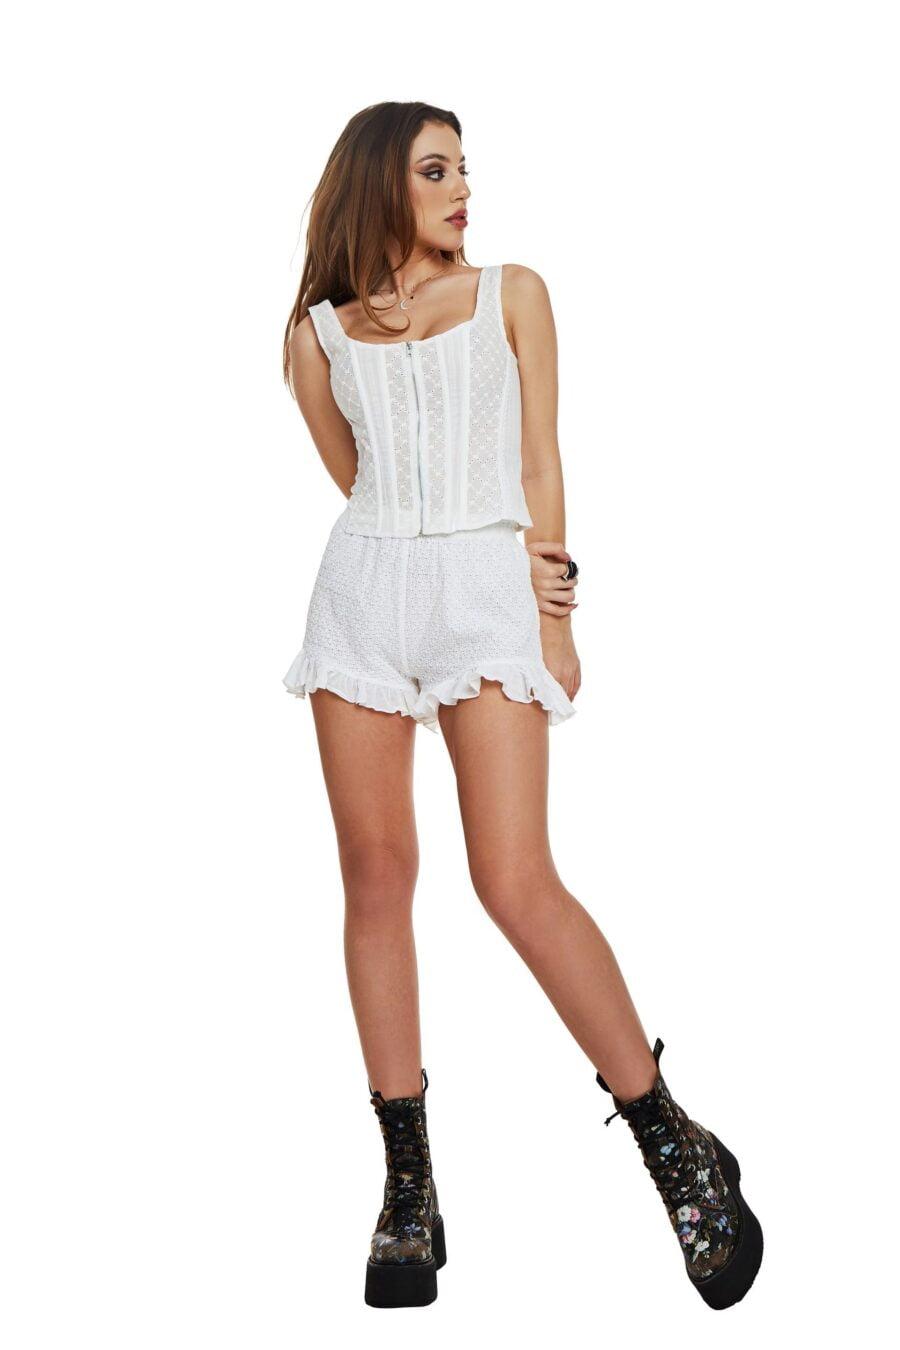 Embroidered boned white corset